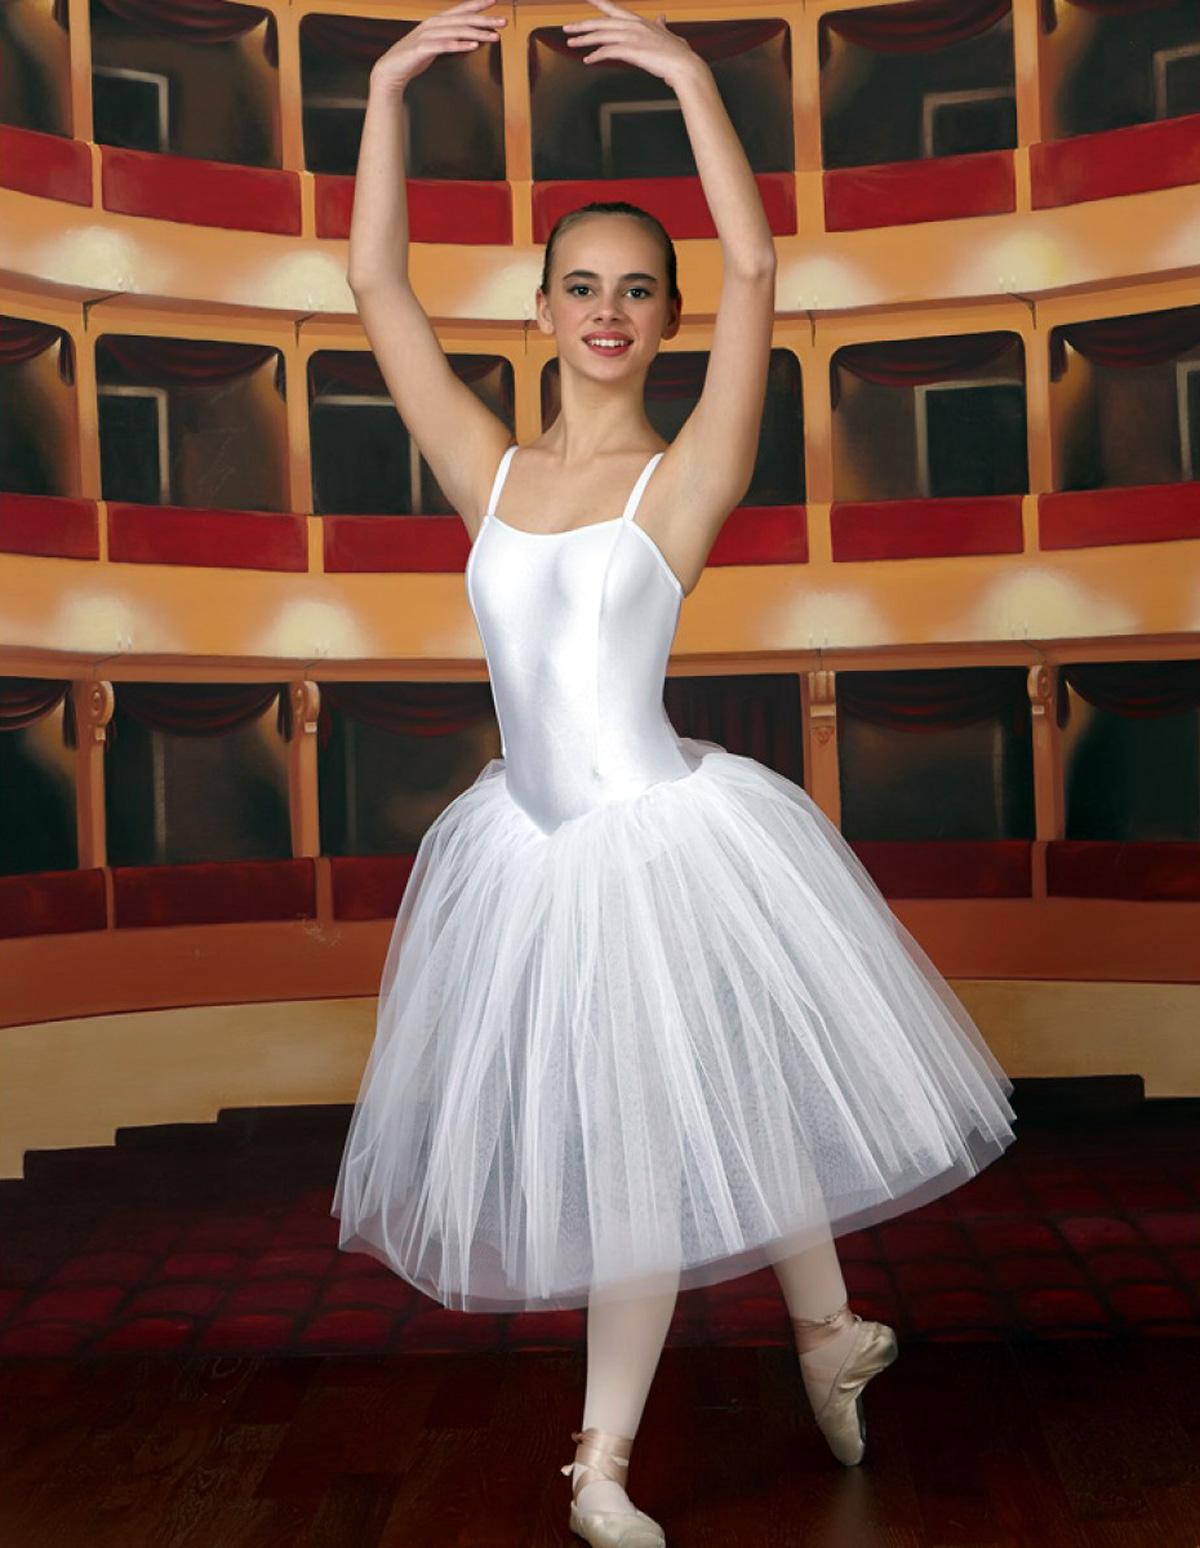 b8ca01c6 Degas tutu danza classica tulle 4 veliTuttodanza